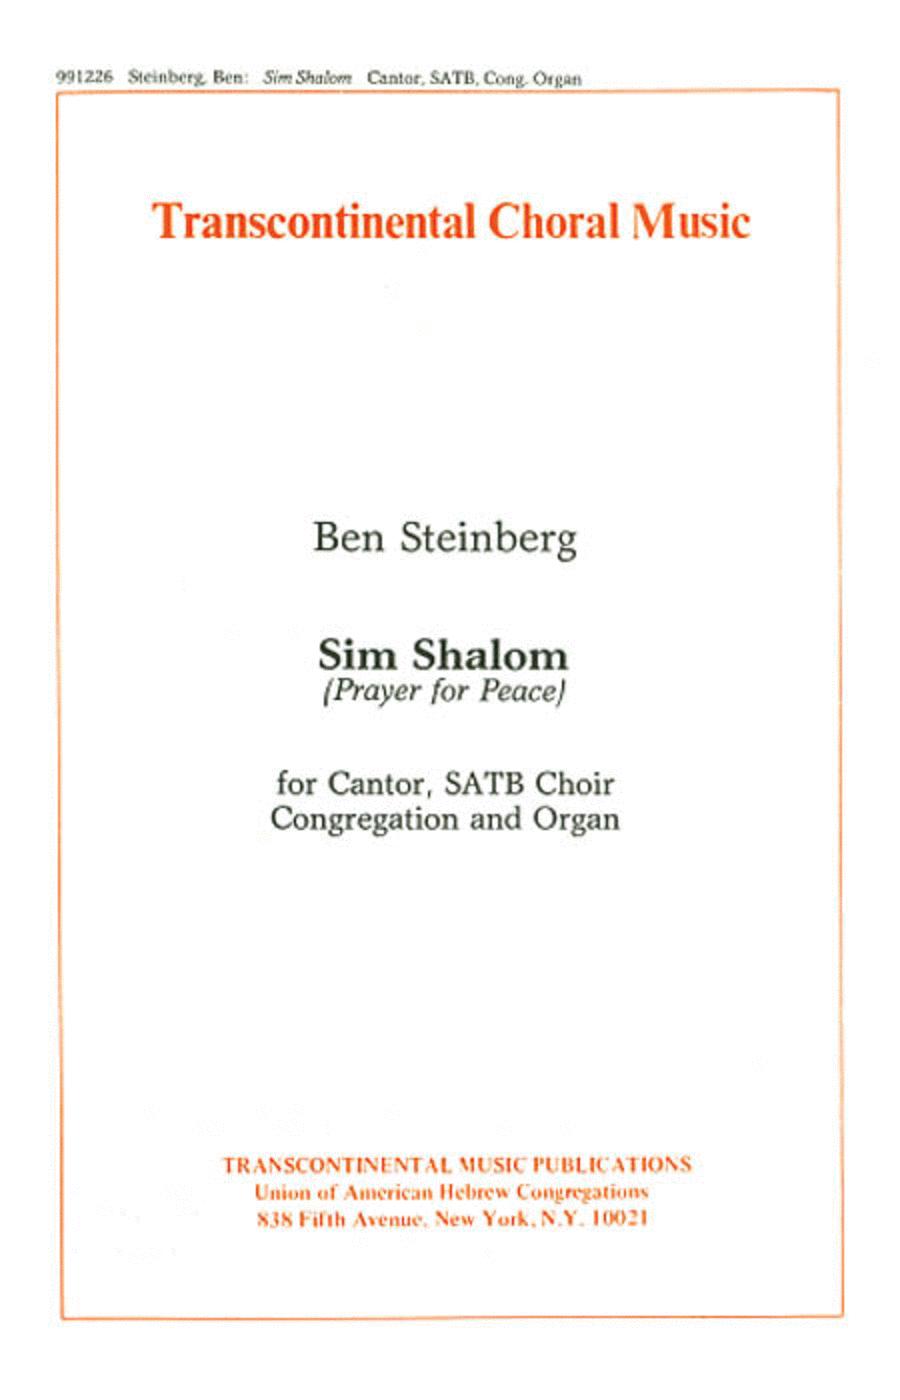 Sim Shalom (Prayer For Peace)